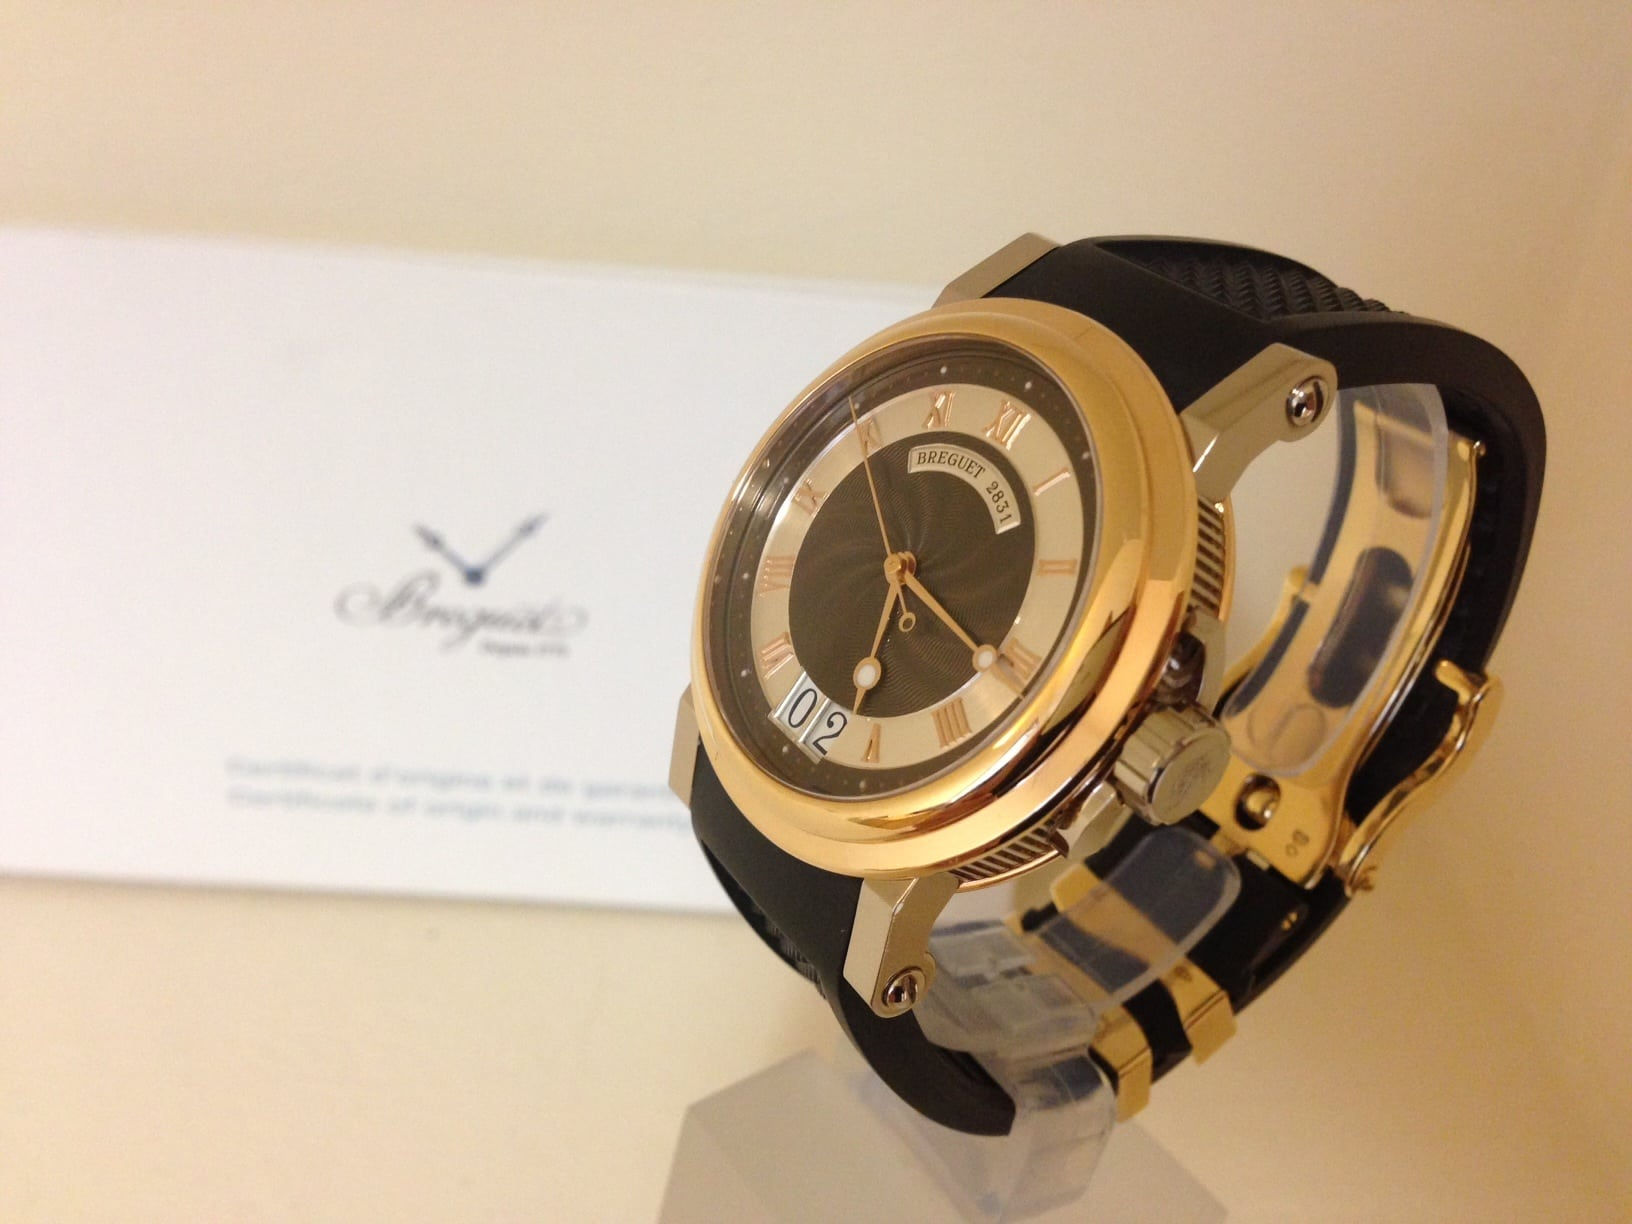 Breguet Marine rose/white gold 'big date' ref 5817